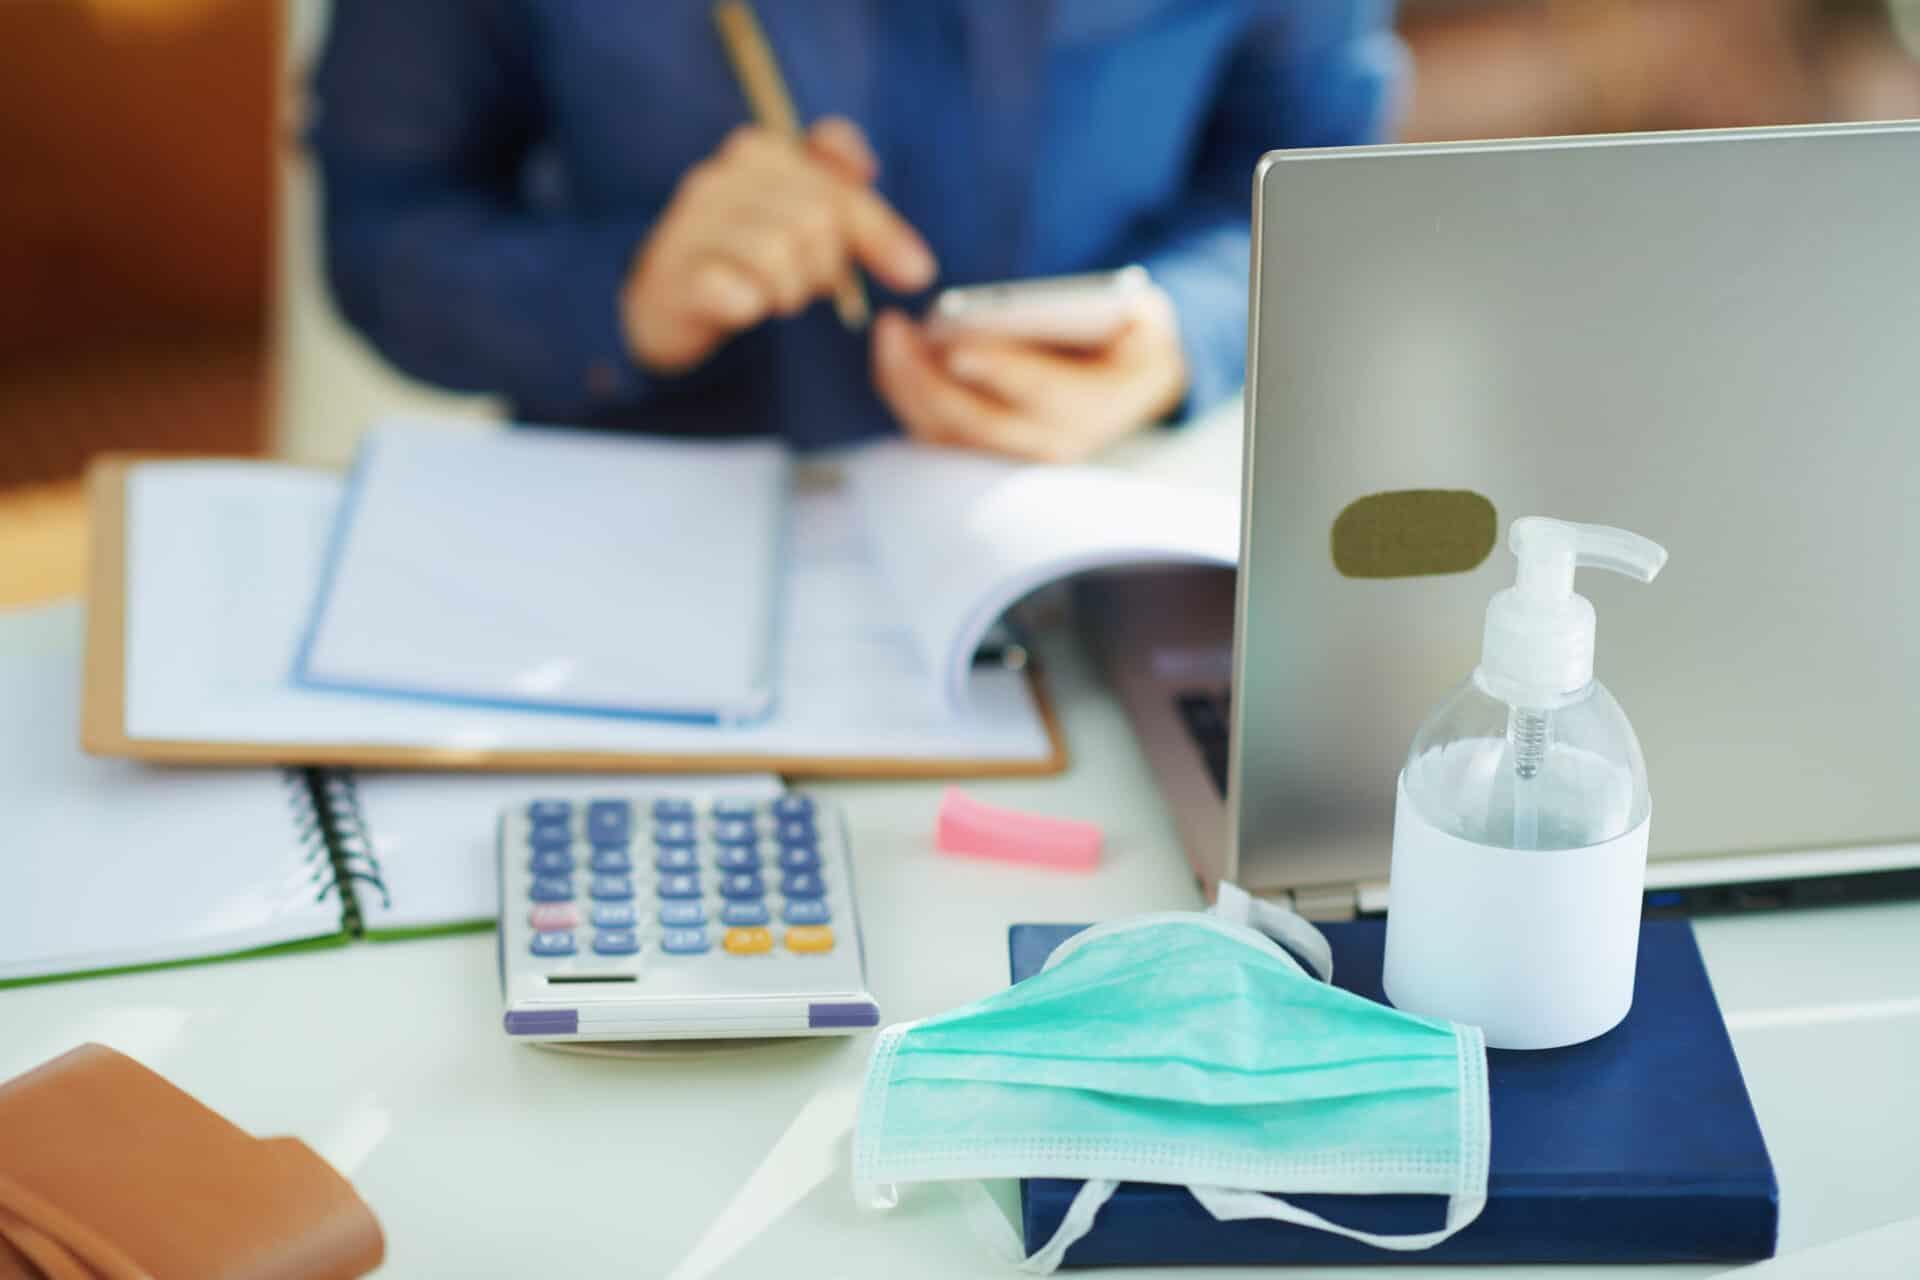 Hygienemaßnahmen am Arbeitsplatz